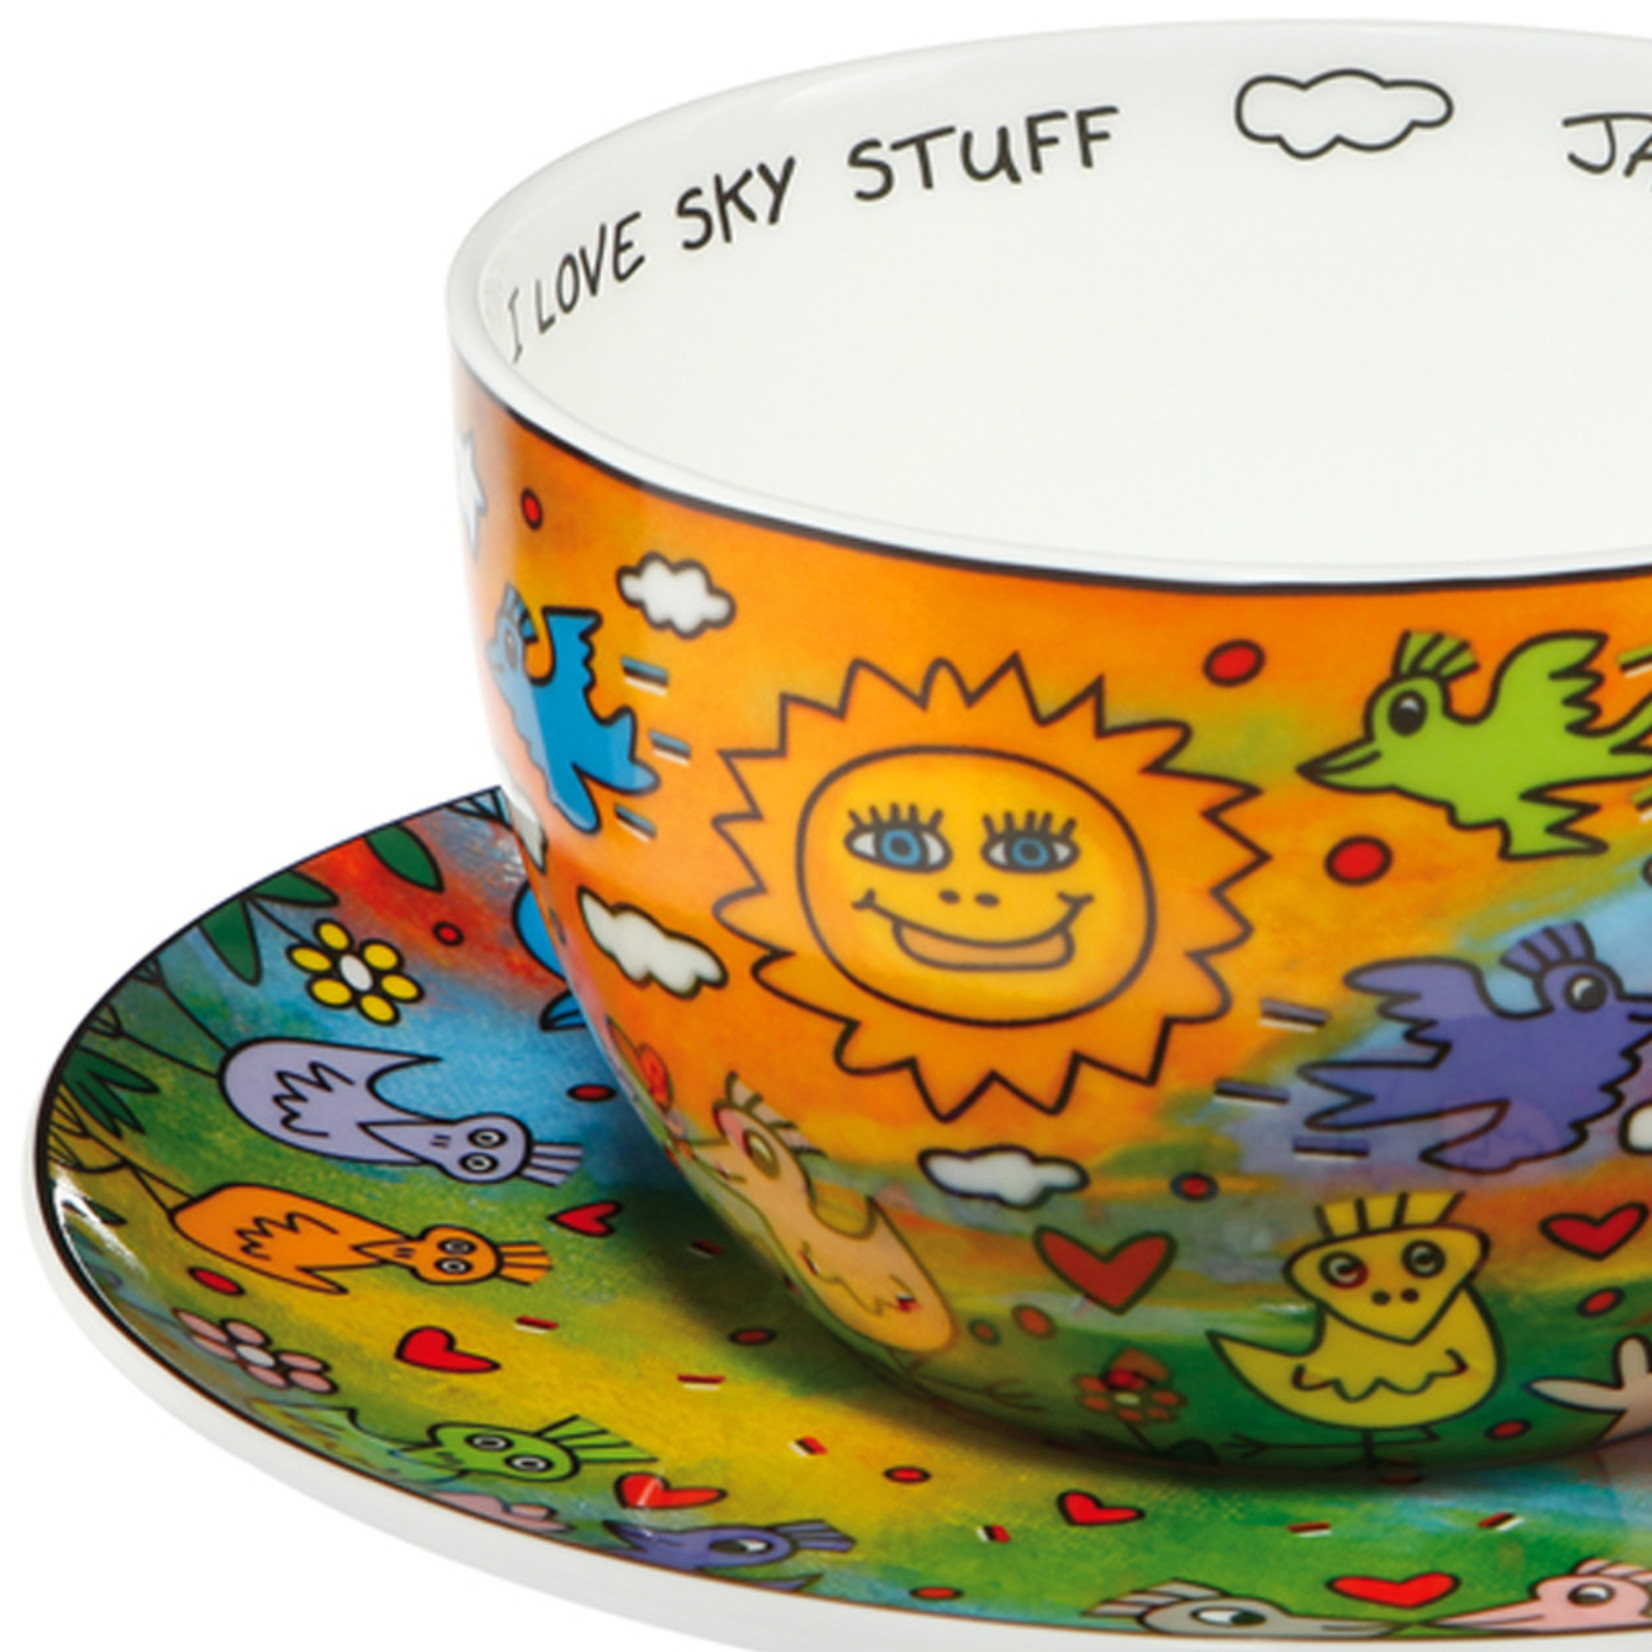 Goebel Porzellanmanufaktur Tasse mit Unterteller   Love Sky Stuff   James Rizzi   Goebel